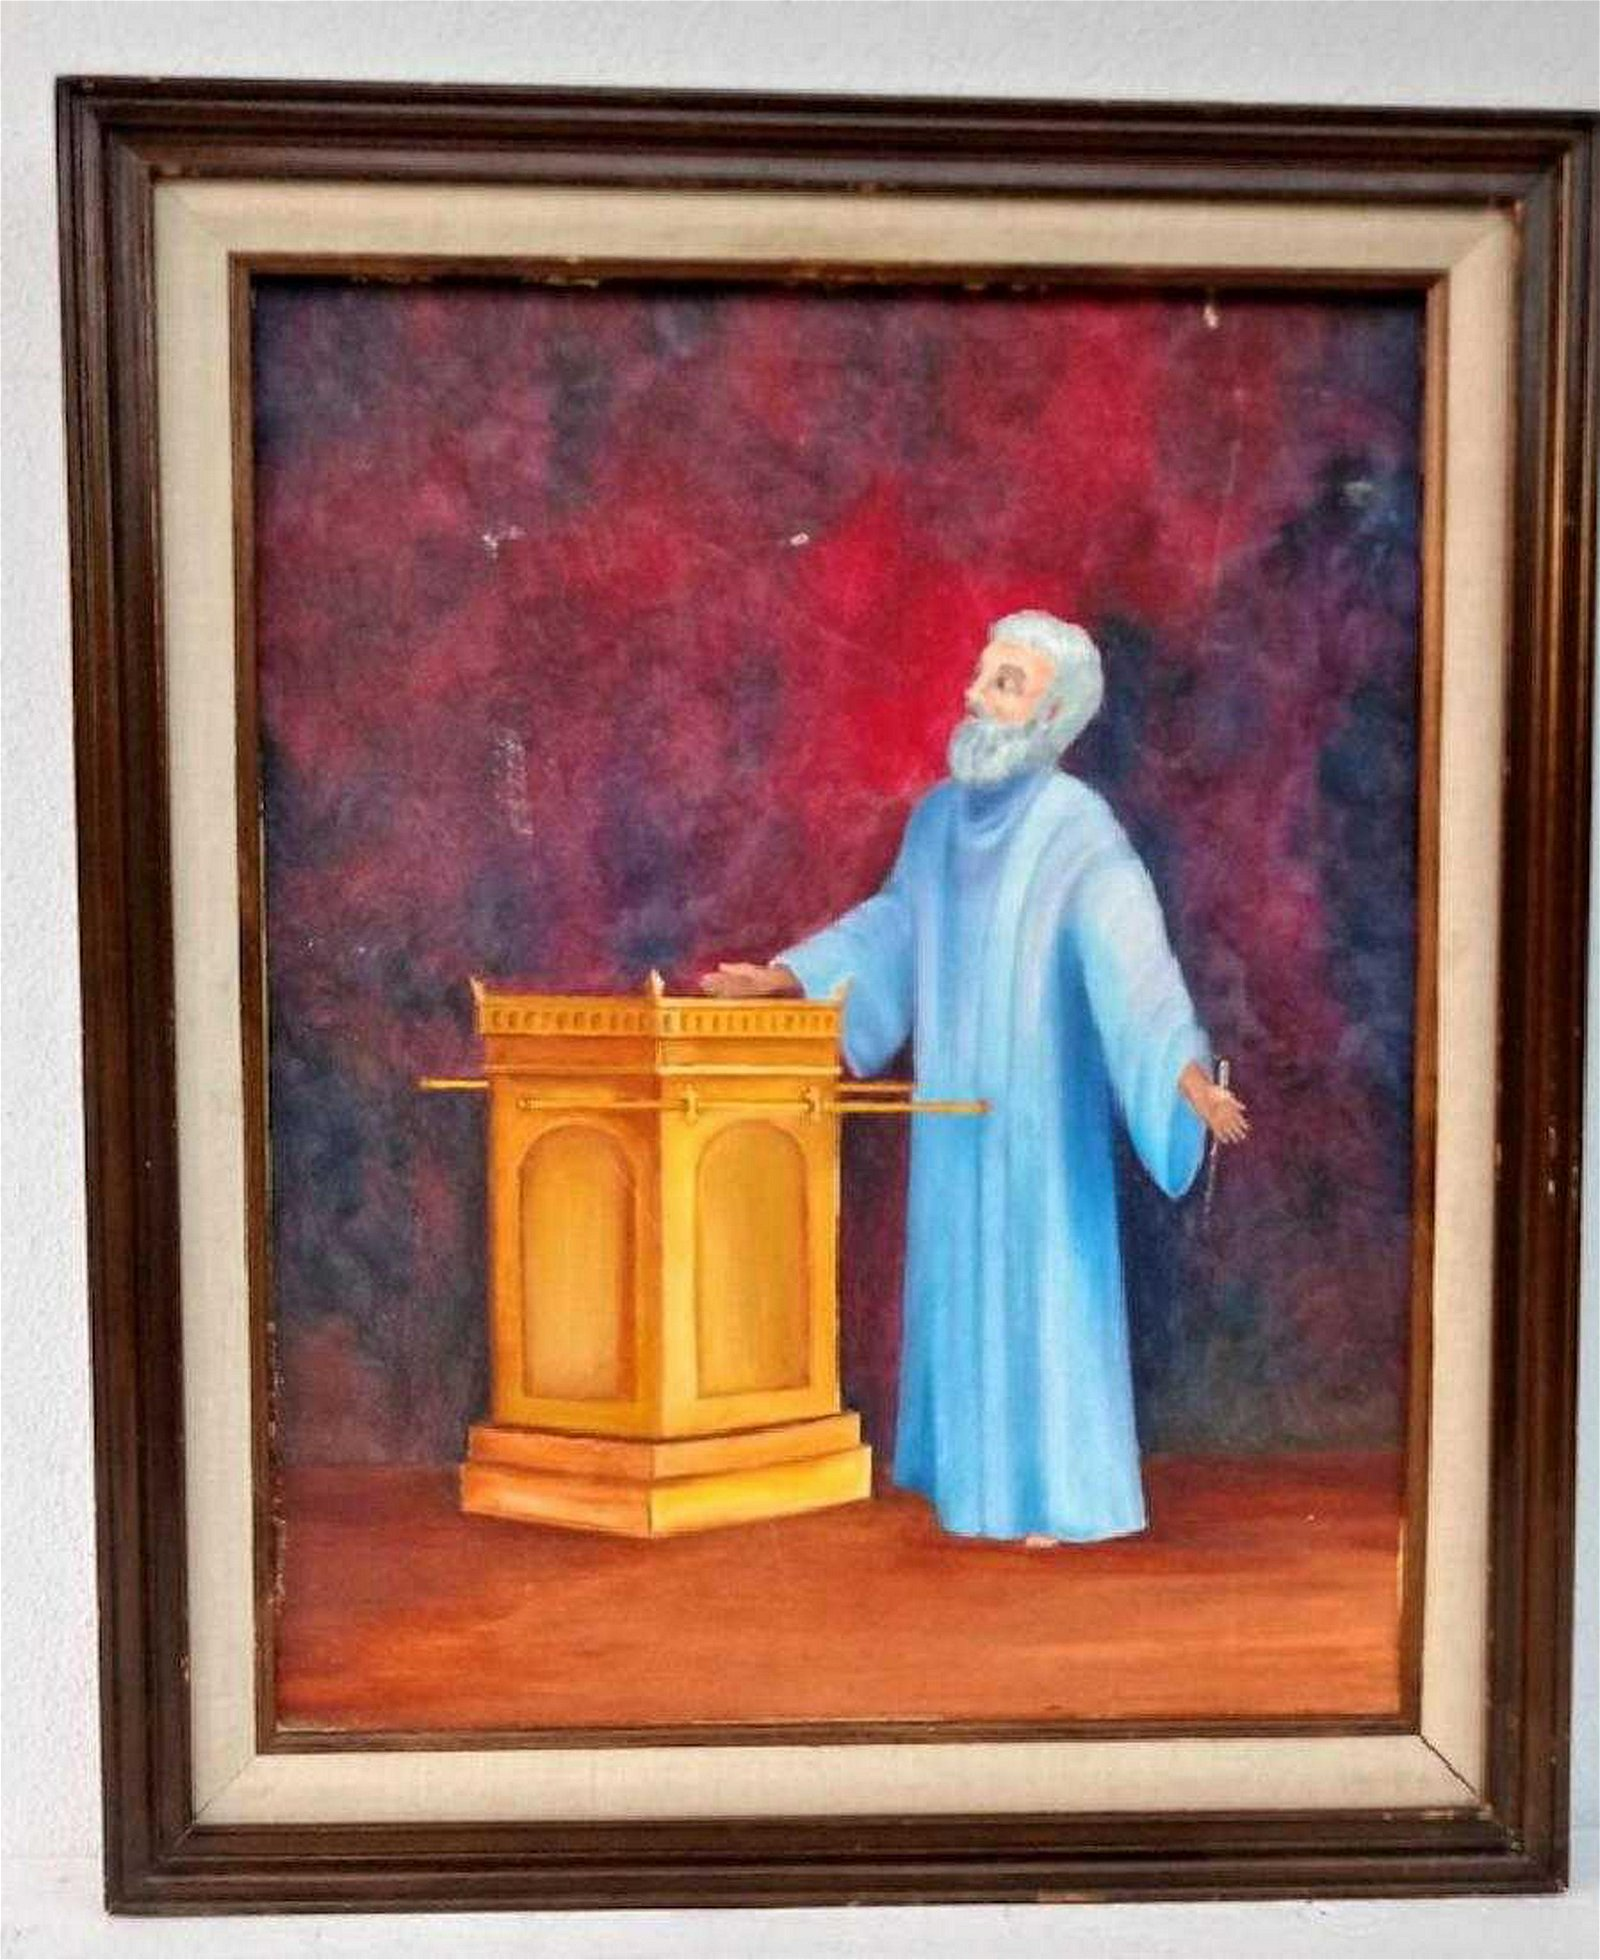 Original Acrylic Painting on Canvas-Framed